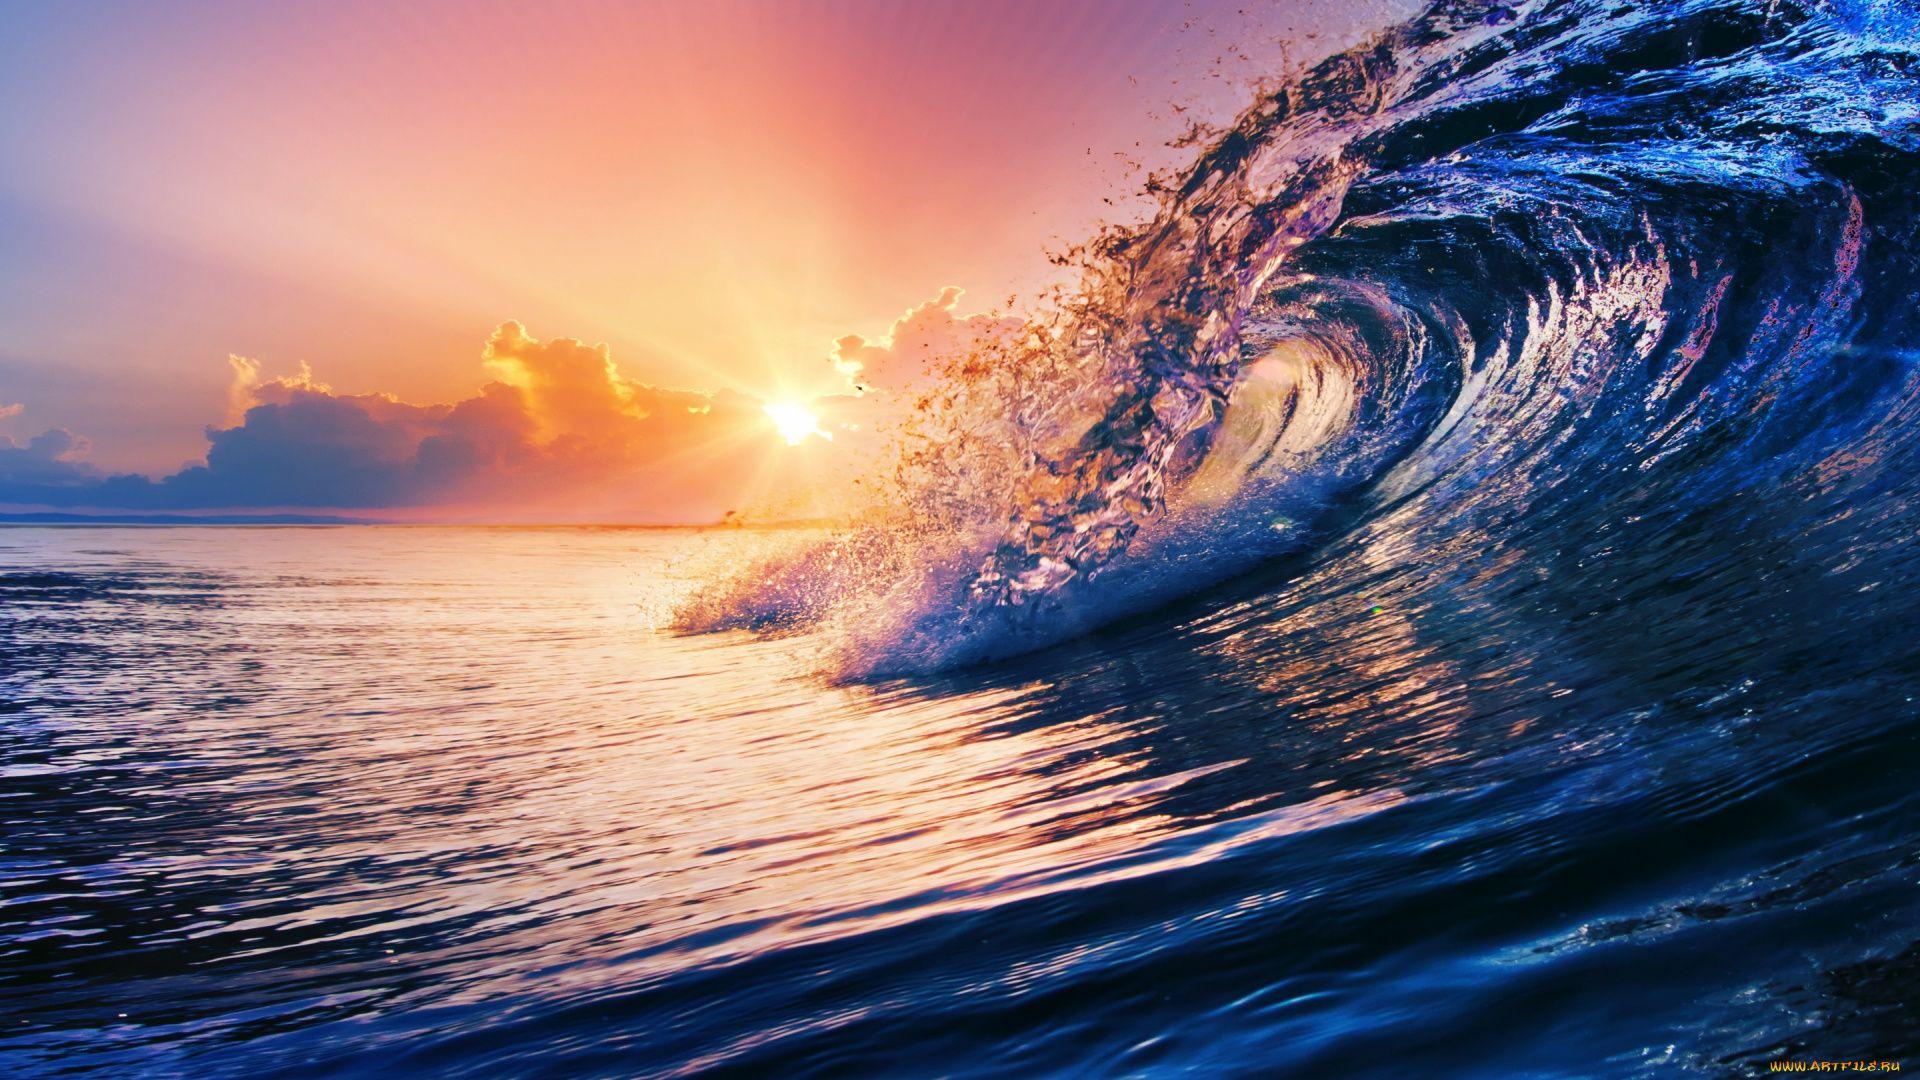 Ocean Sunset wallpaper picture hd